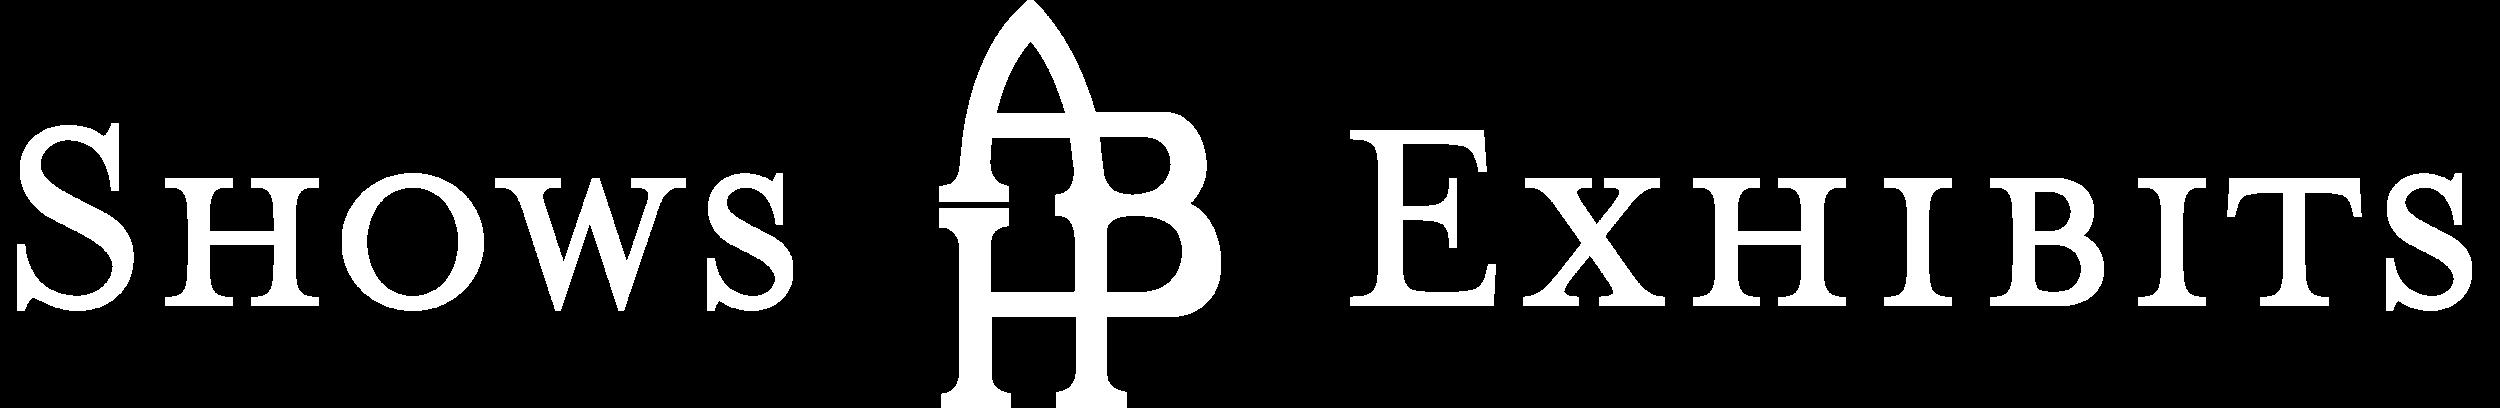 ABH_Logo_ShowsExhibits_MrsEavesSmallCaps_white.png